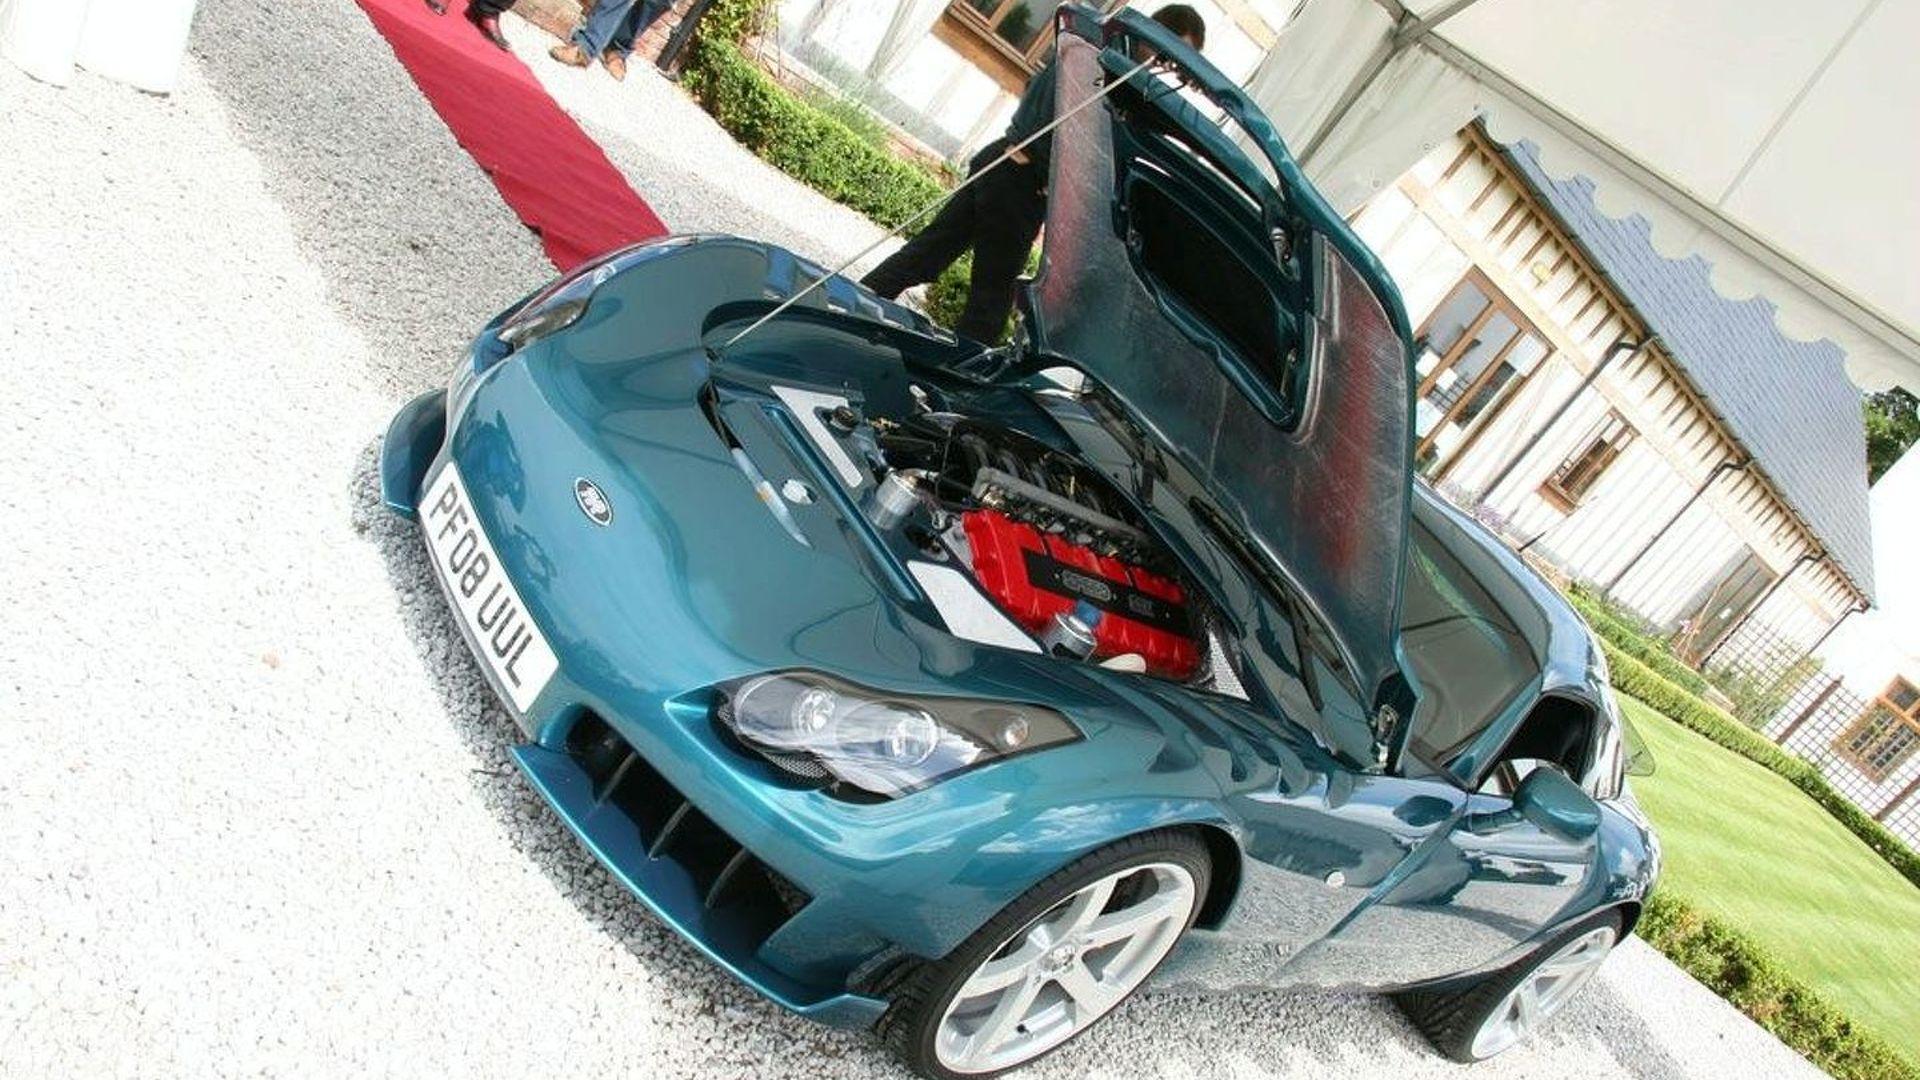 TVR Production Restarts - 2008 Sagaris Presented